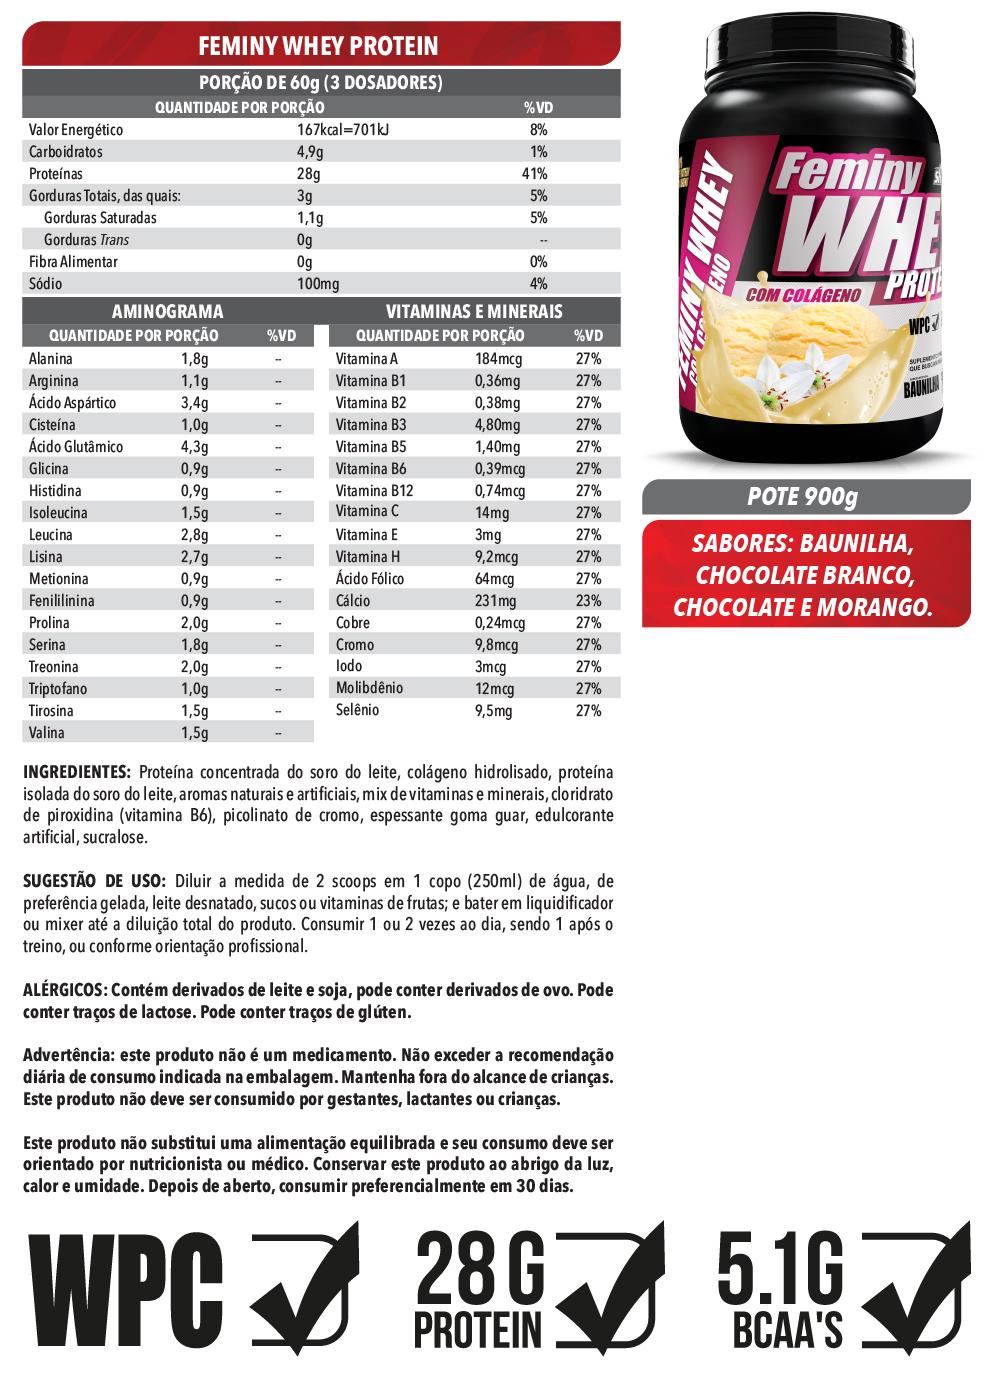 Feminy Whey Protein 900g - Chocolate